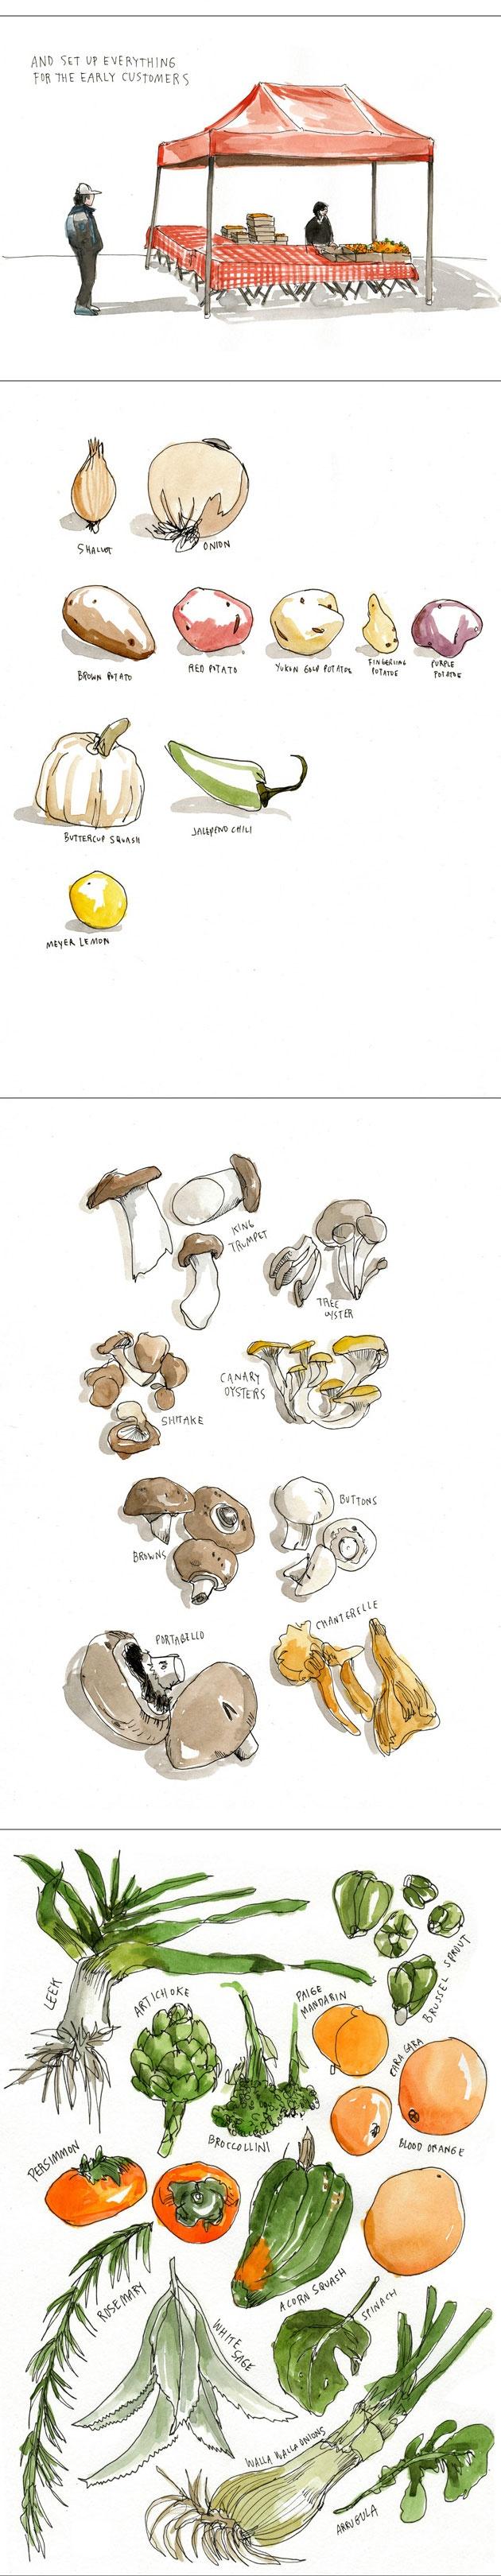 Illustration style to practice